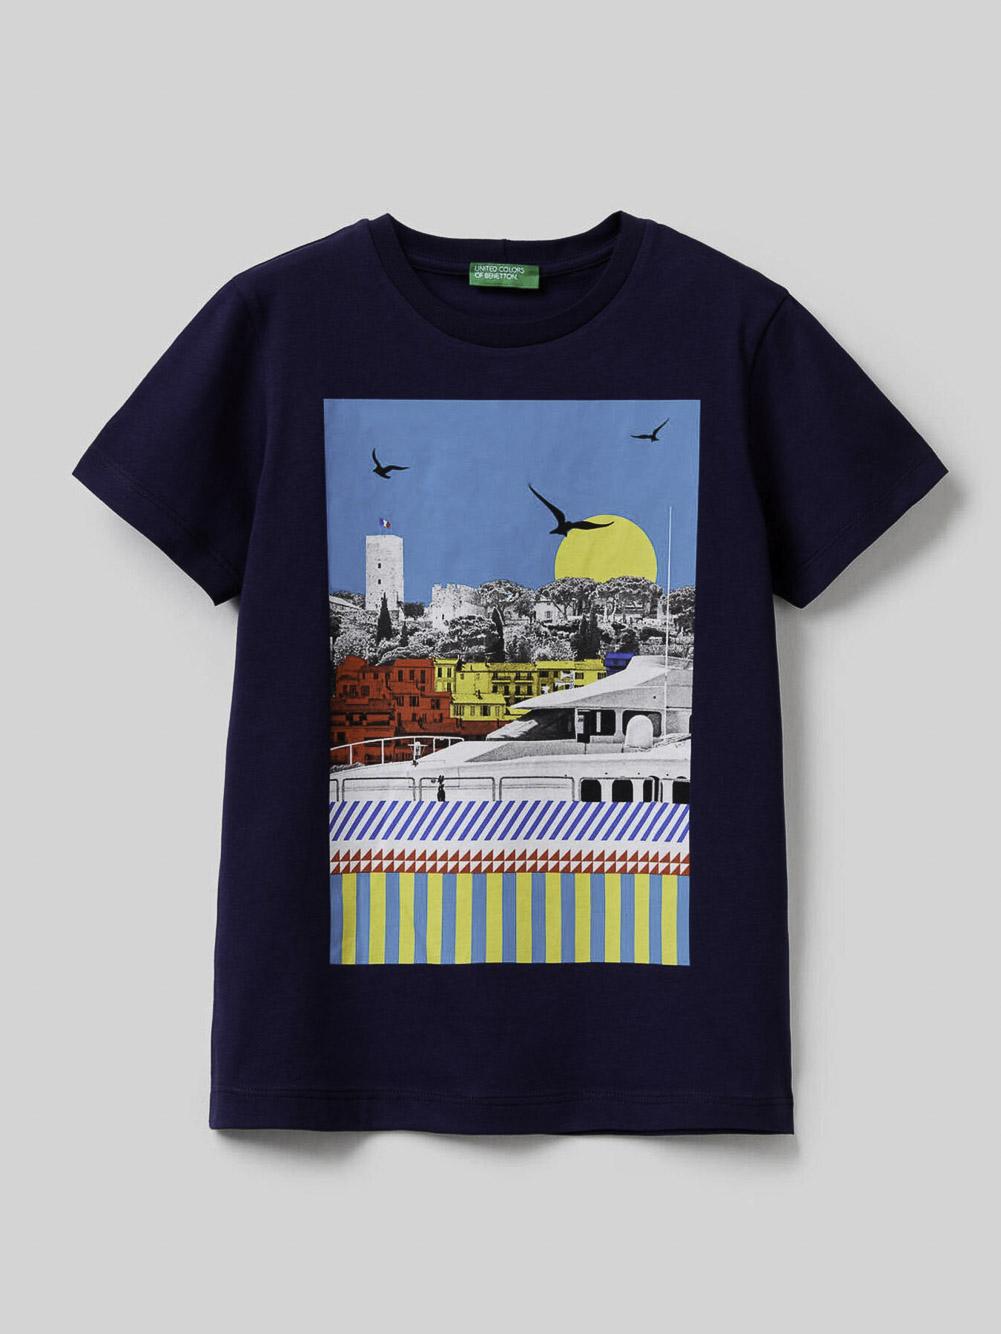 012 BENETTON Μπλούζα t-shirt 3096C14OU 20P252